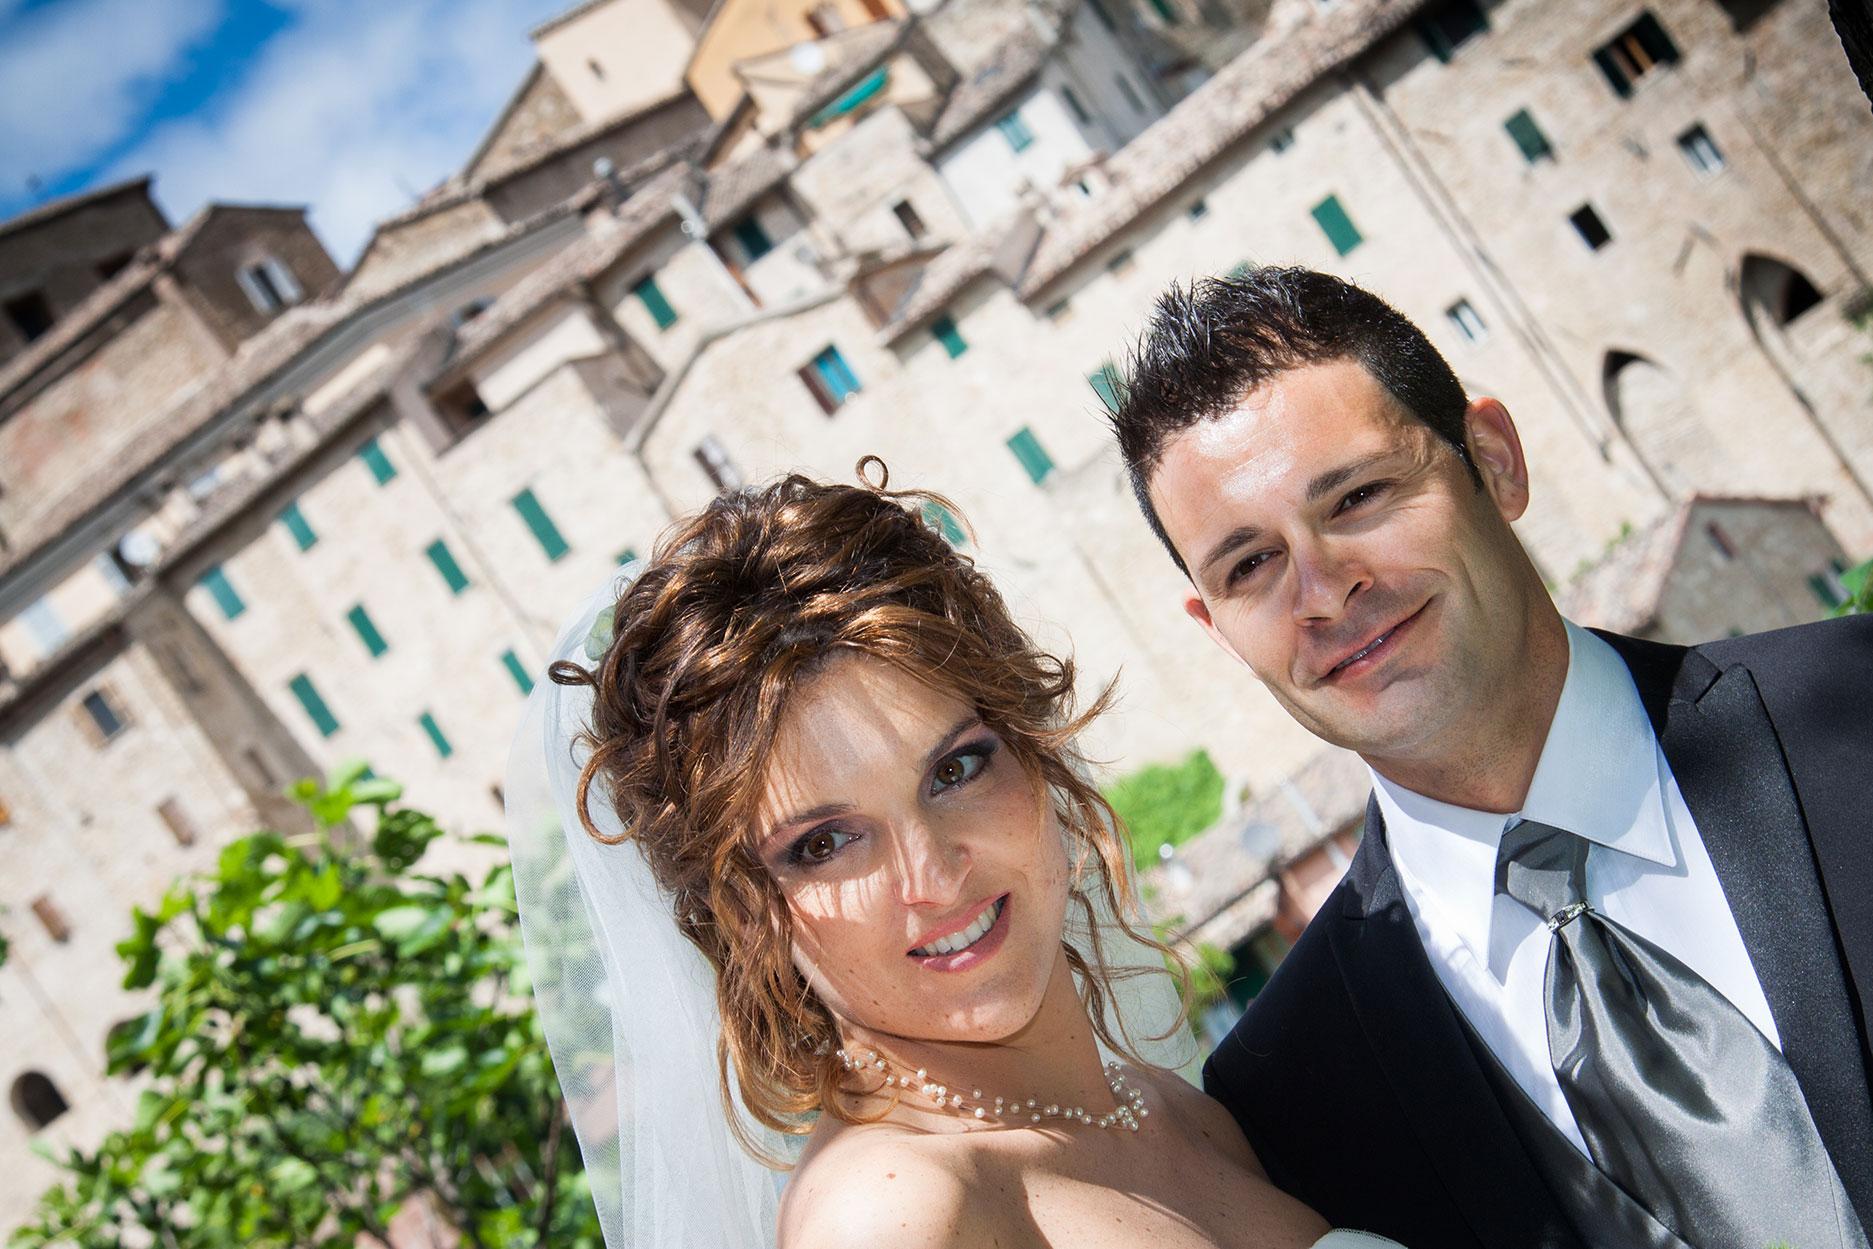 Francesca-Ferrati-wedding-photographer-Verona-Federica-Giovanni24